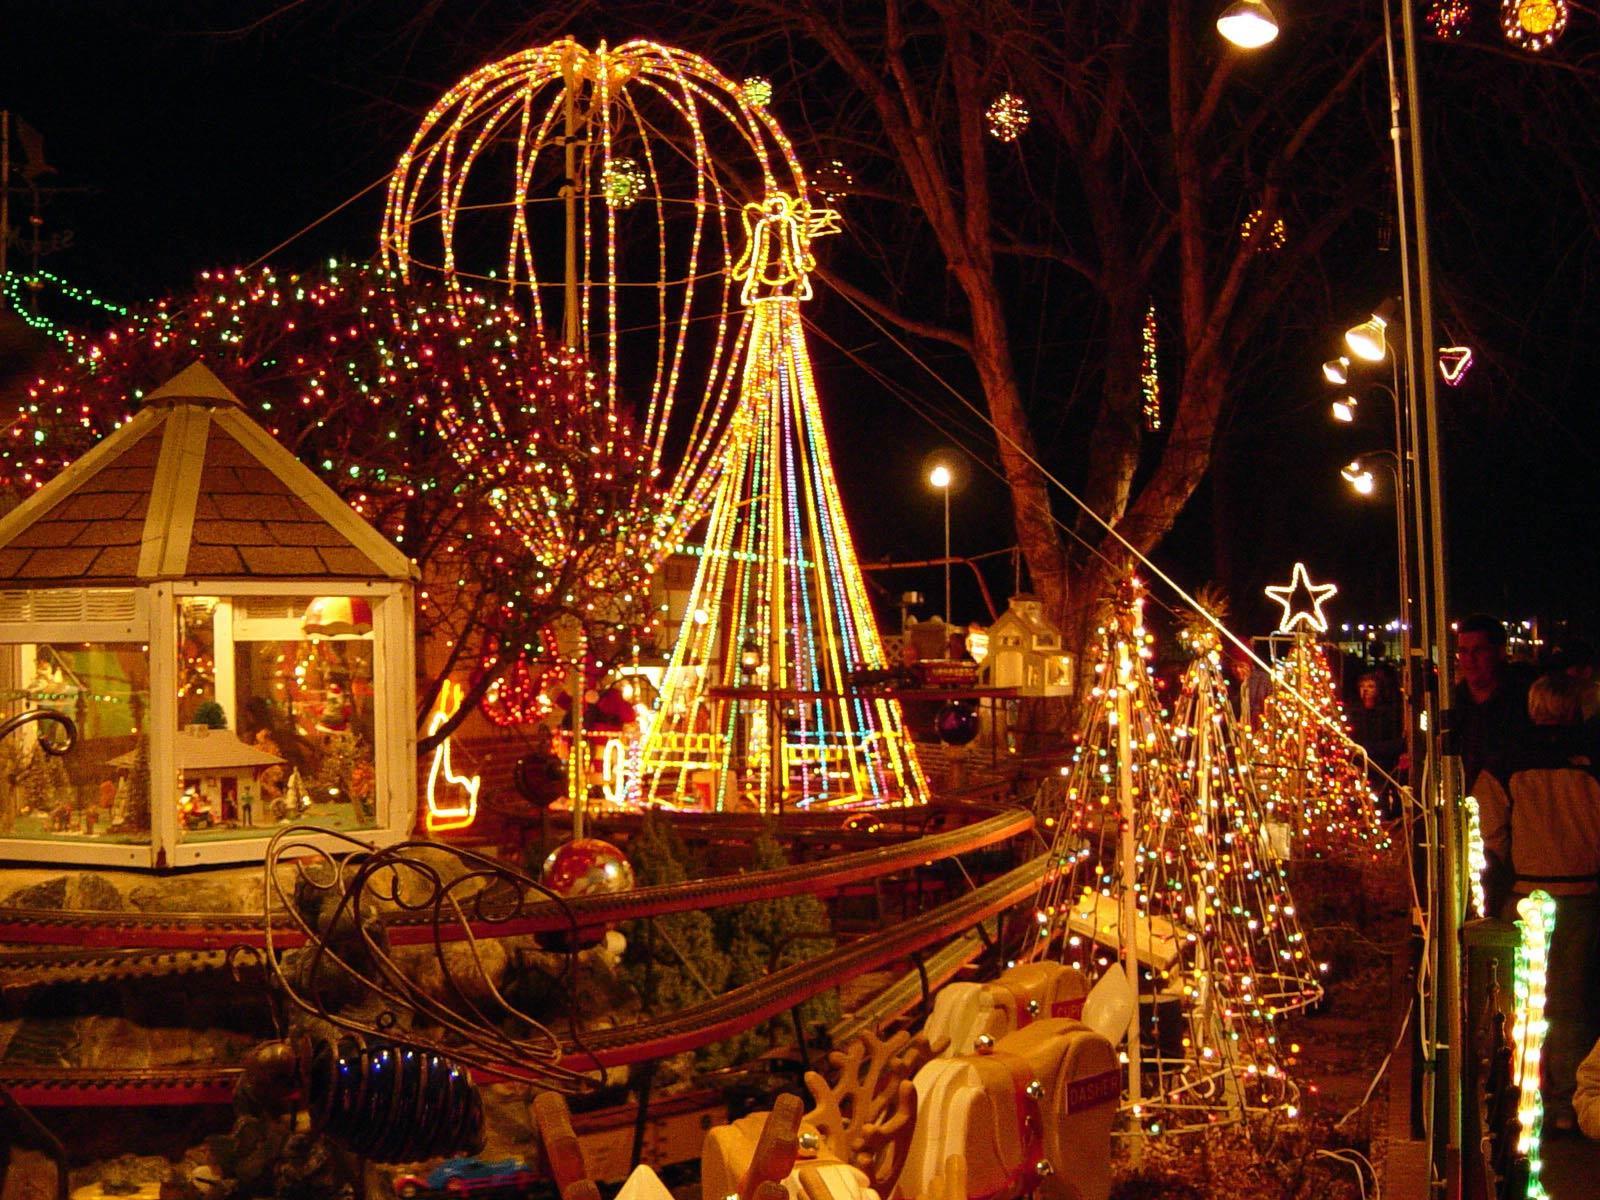 http://4.bp.blogspot.com/_WXq2gYQHNLI/TP1X6rJPgeI/AAAAAAAAAJU/r9eVGH_ZN-U/s1600/christmas_lights_tour.jpg